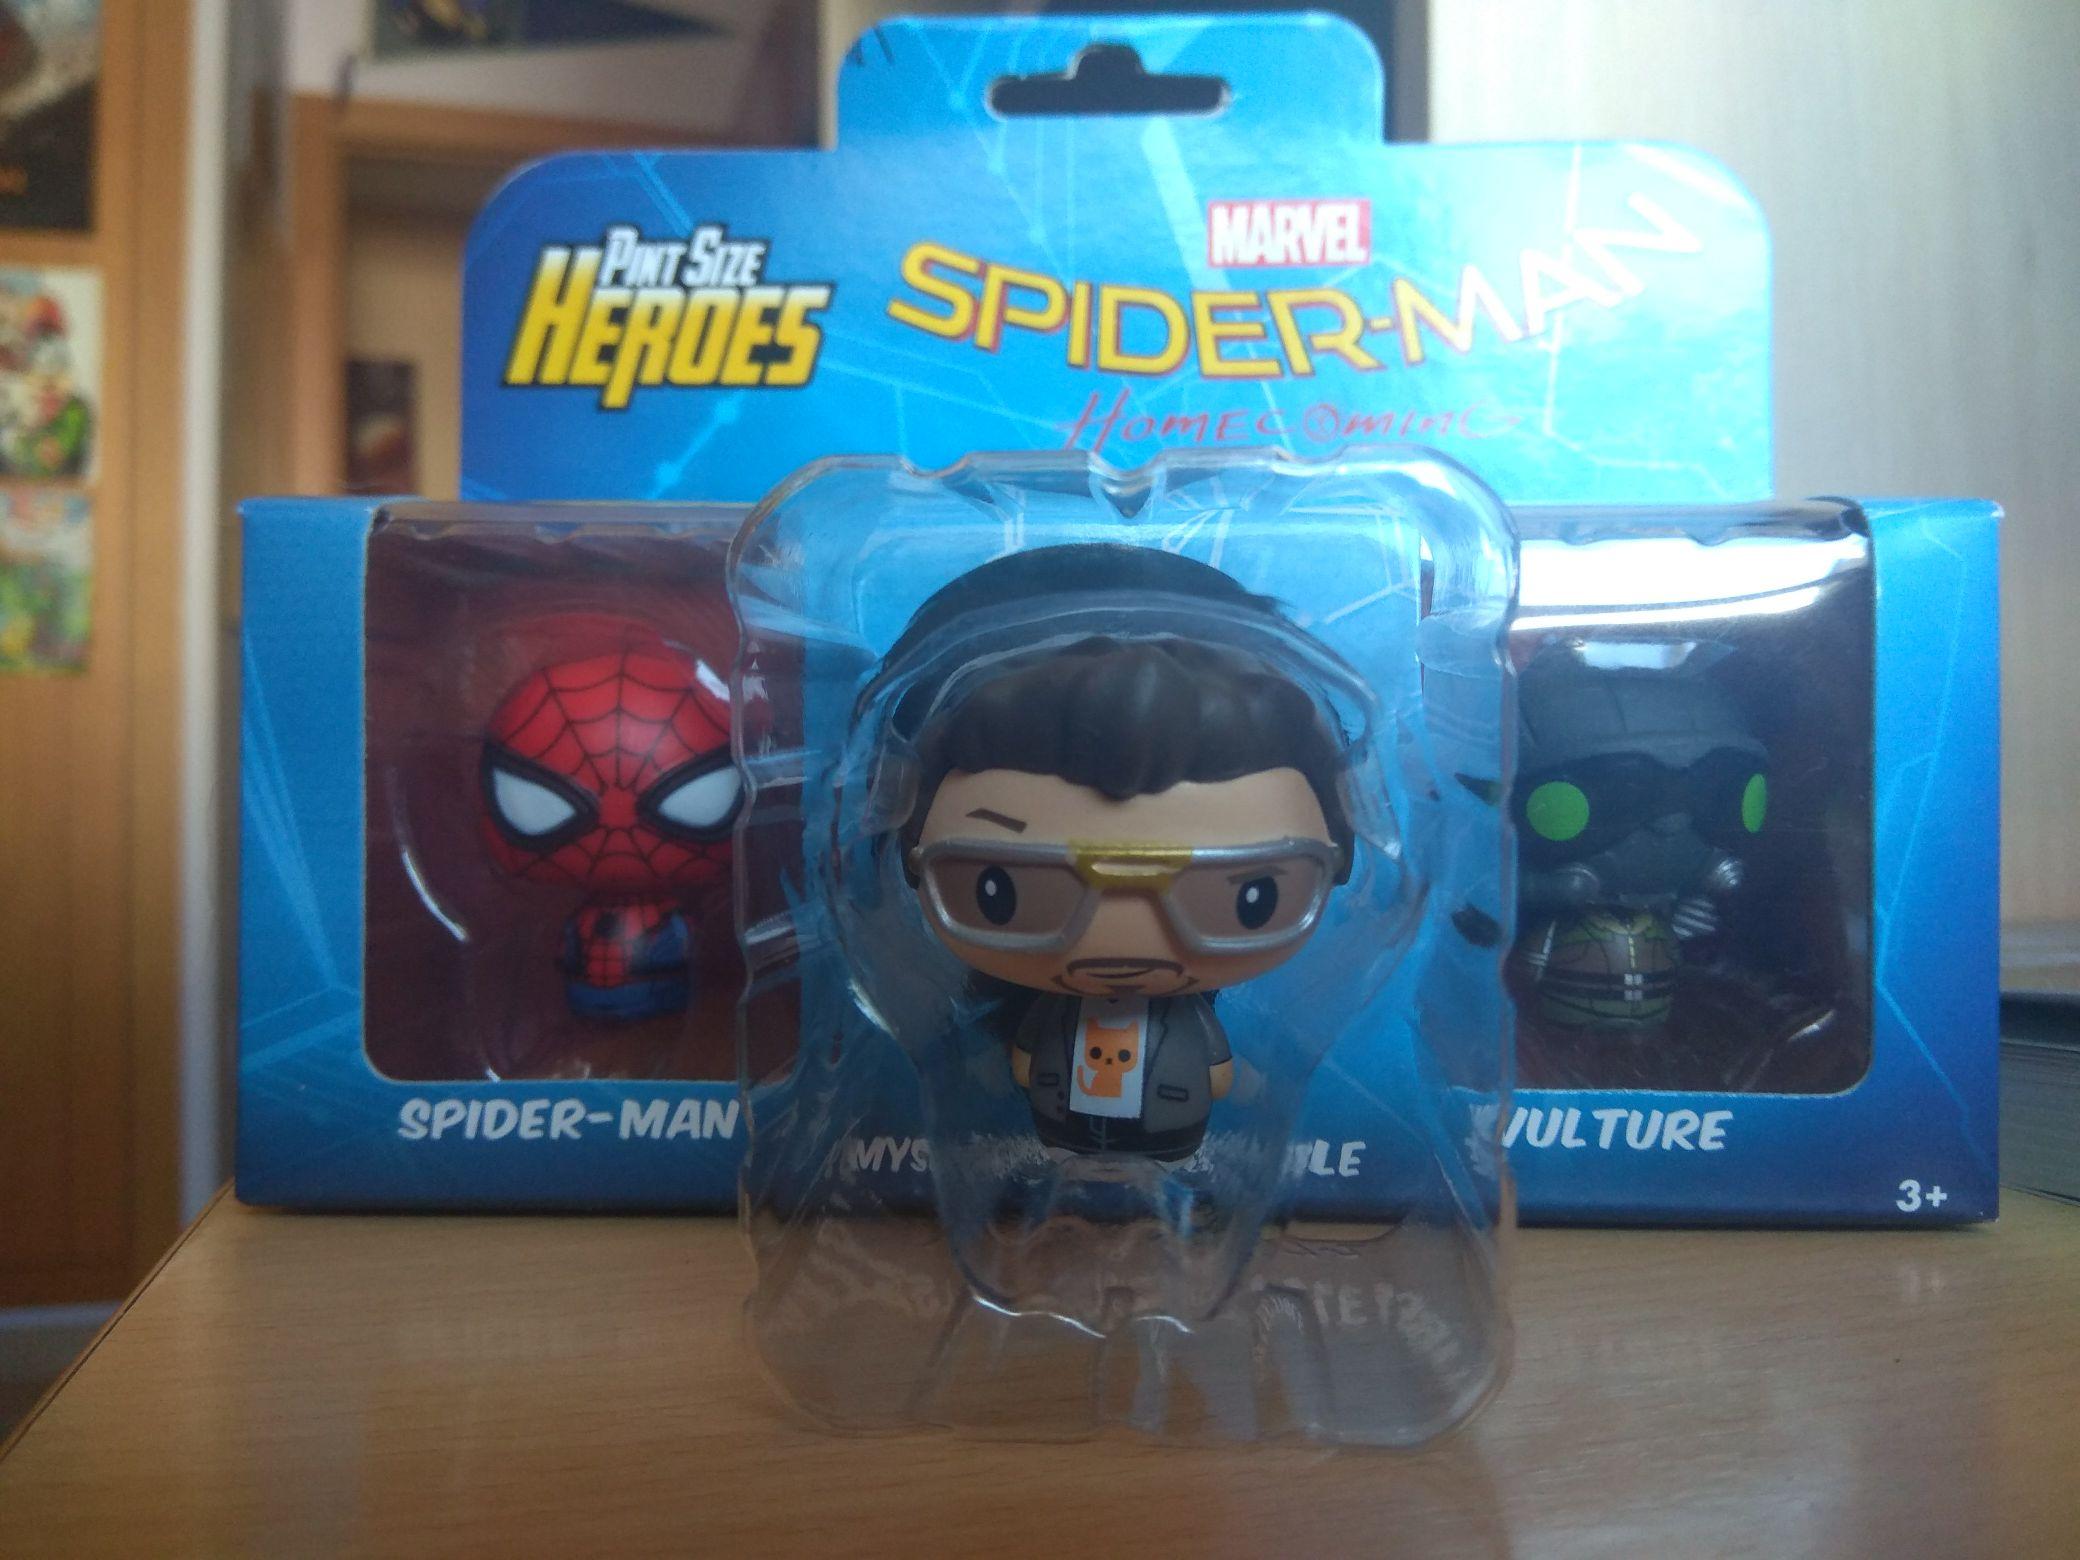 Pack 3 Funko Dorbz - Spiderman y Vulture